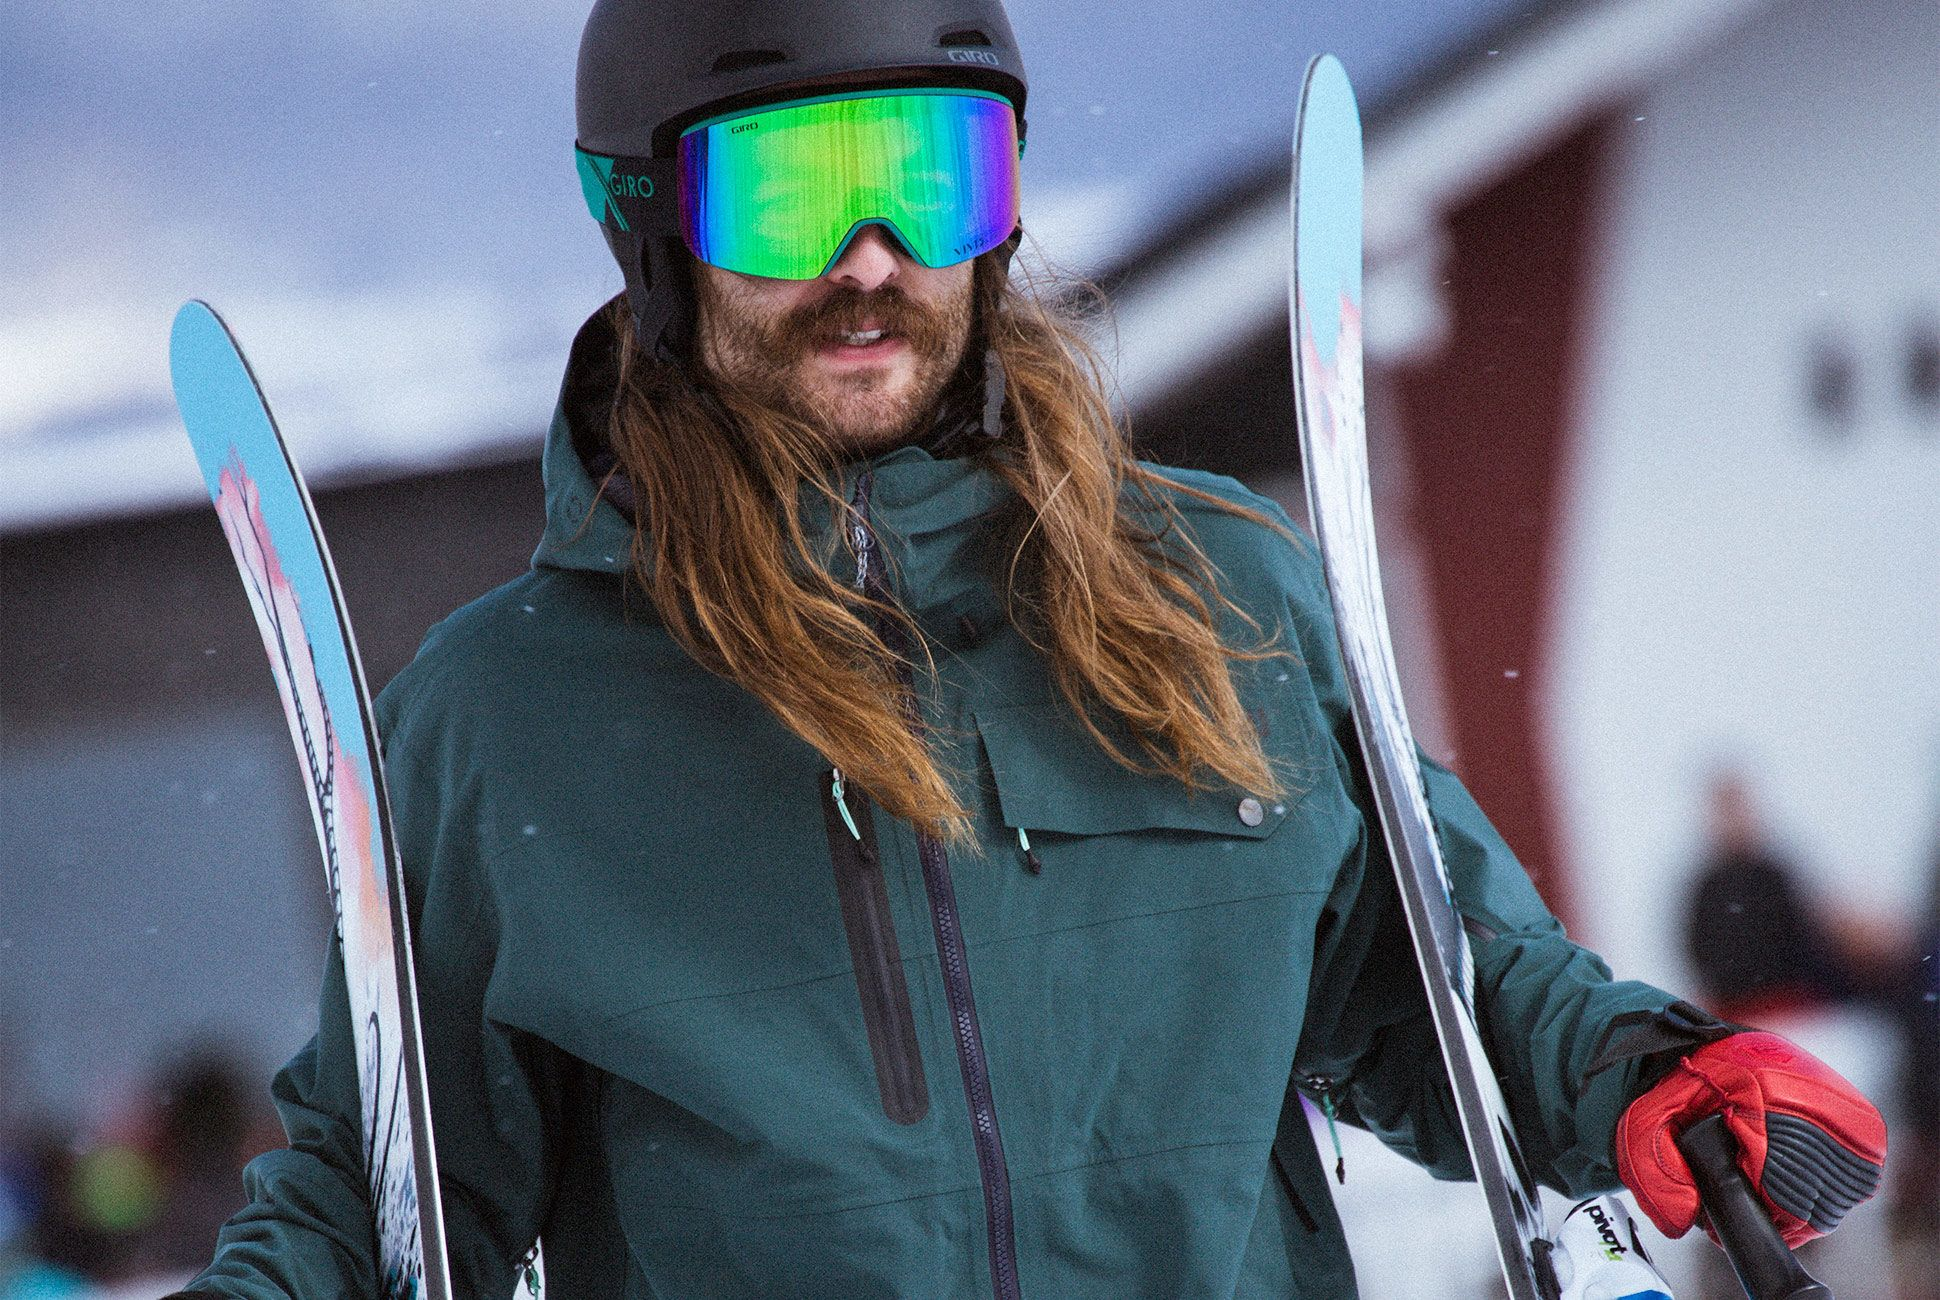 ultimate-ski-and-snow-gear-patrol-trew-slide-1